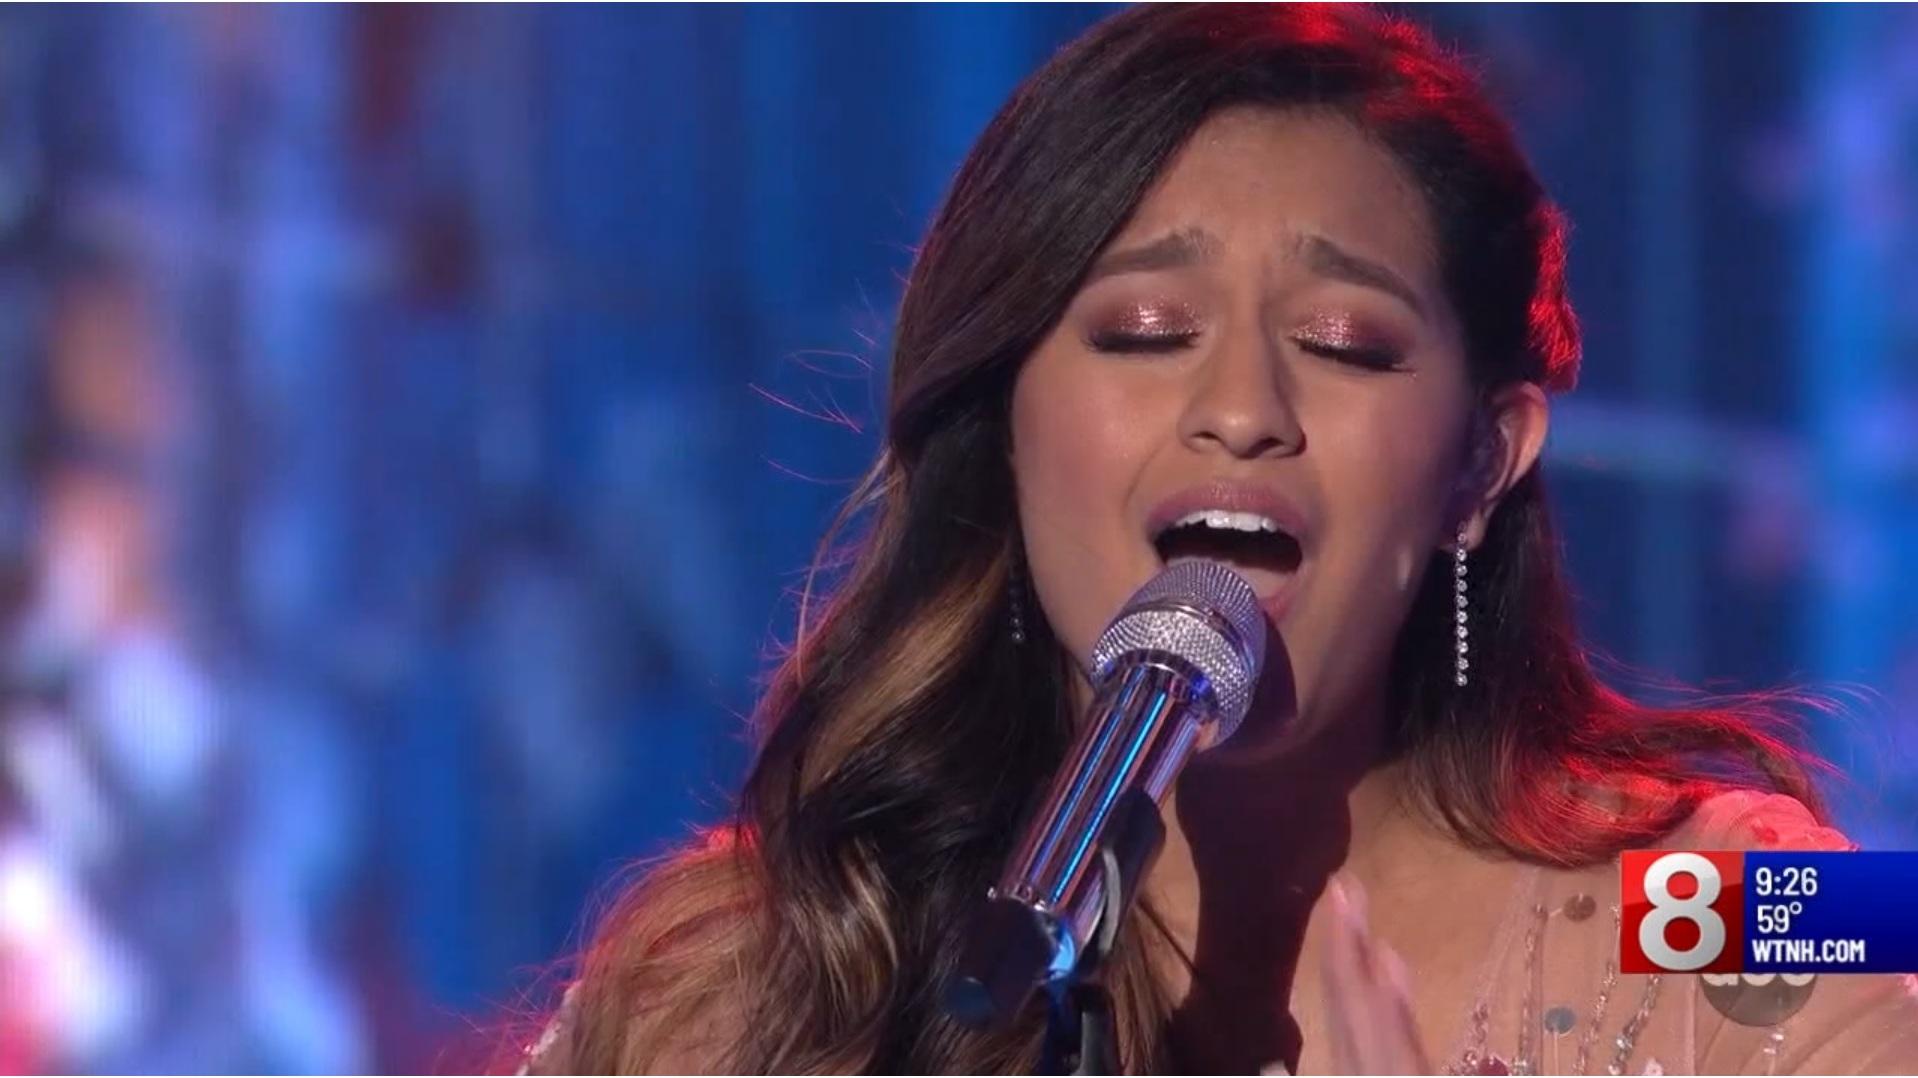 American Idol Recap: Disney Night - Two Contestants Miss the Top 8